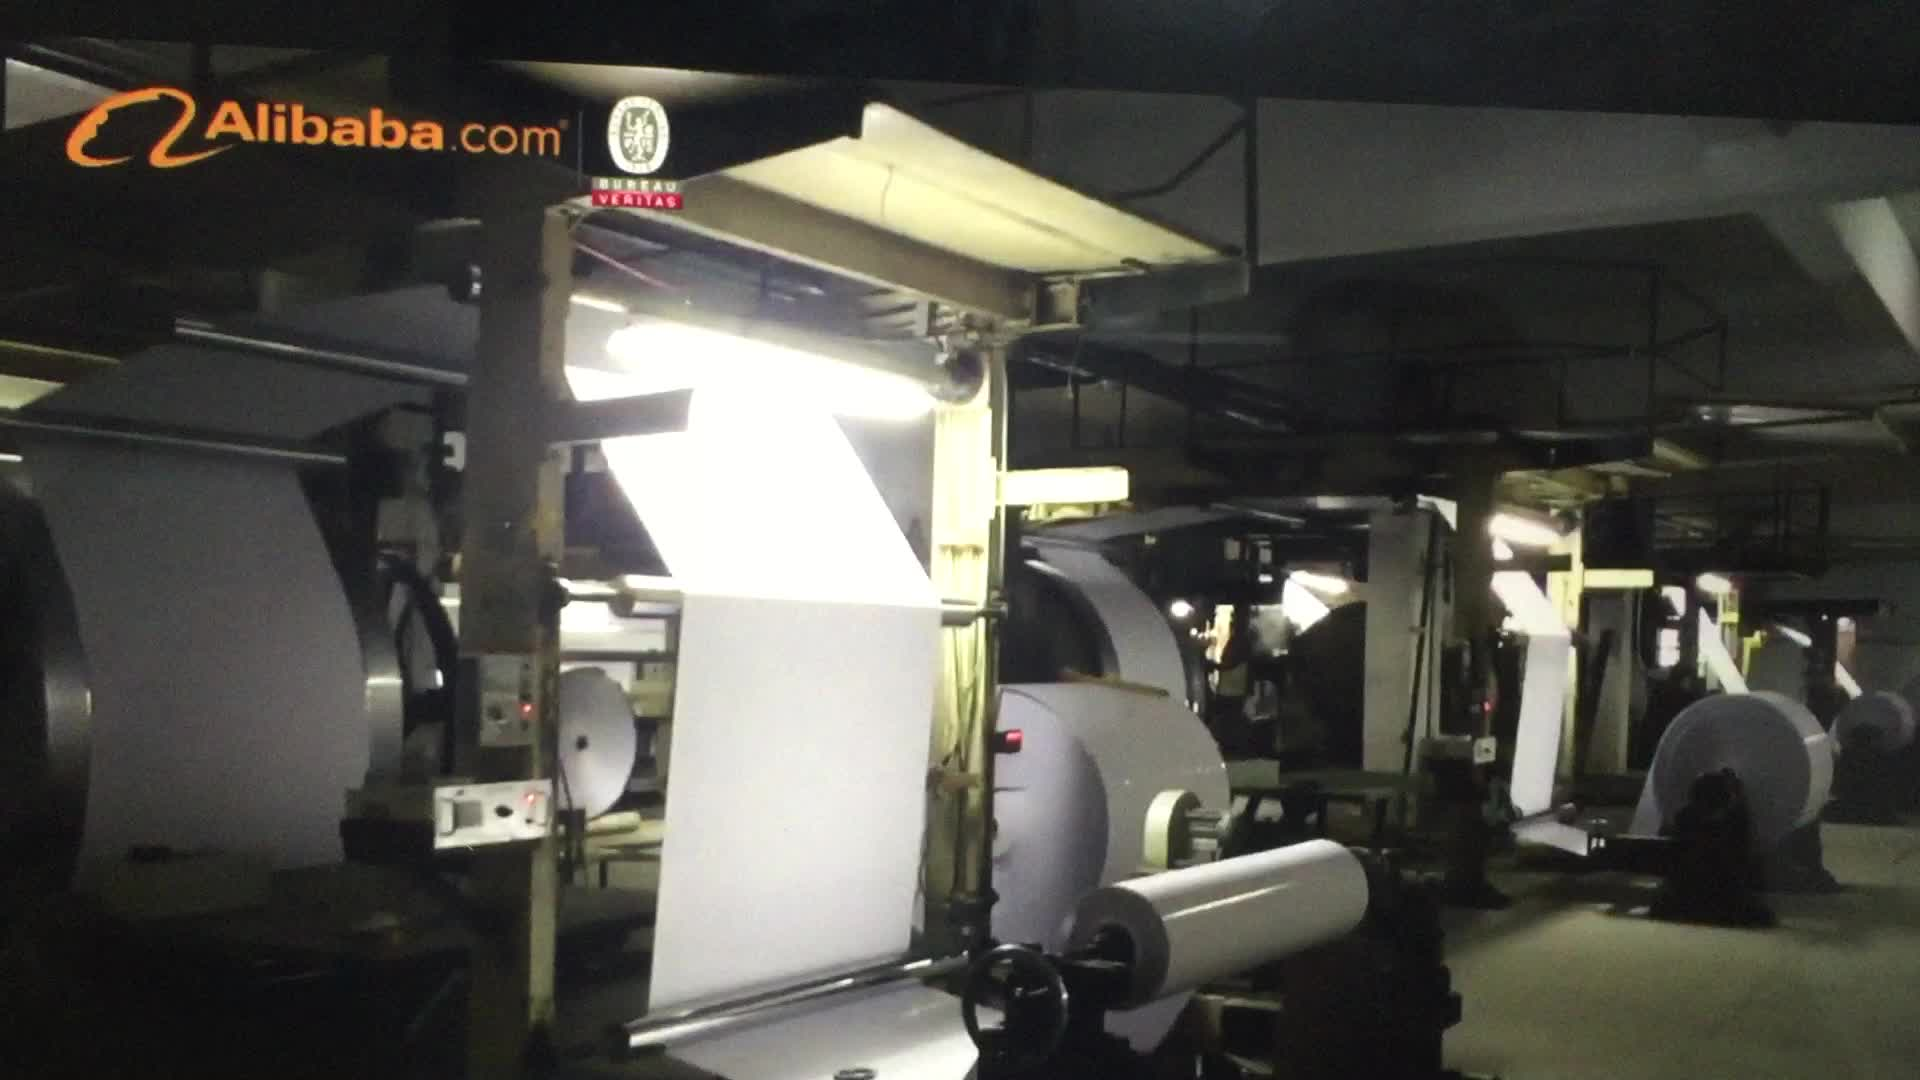 Koala cristal Ultra glossy photo paper, 115g-260g premium papel lustroso elevado do inkjet